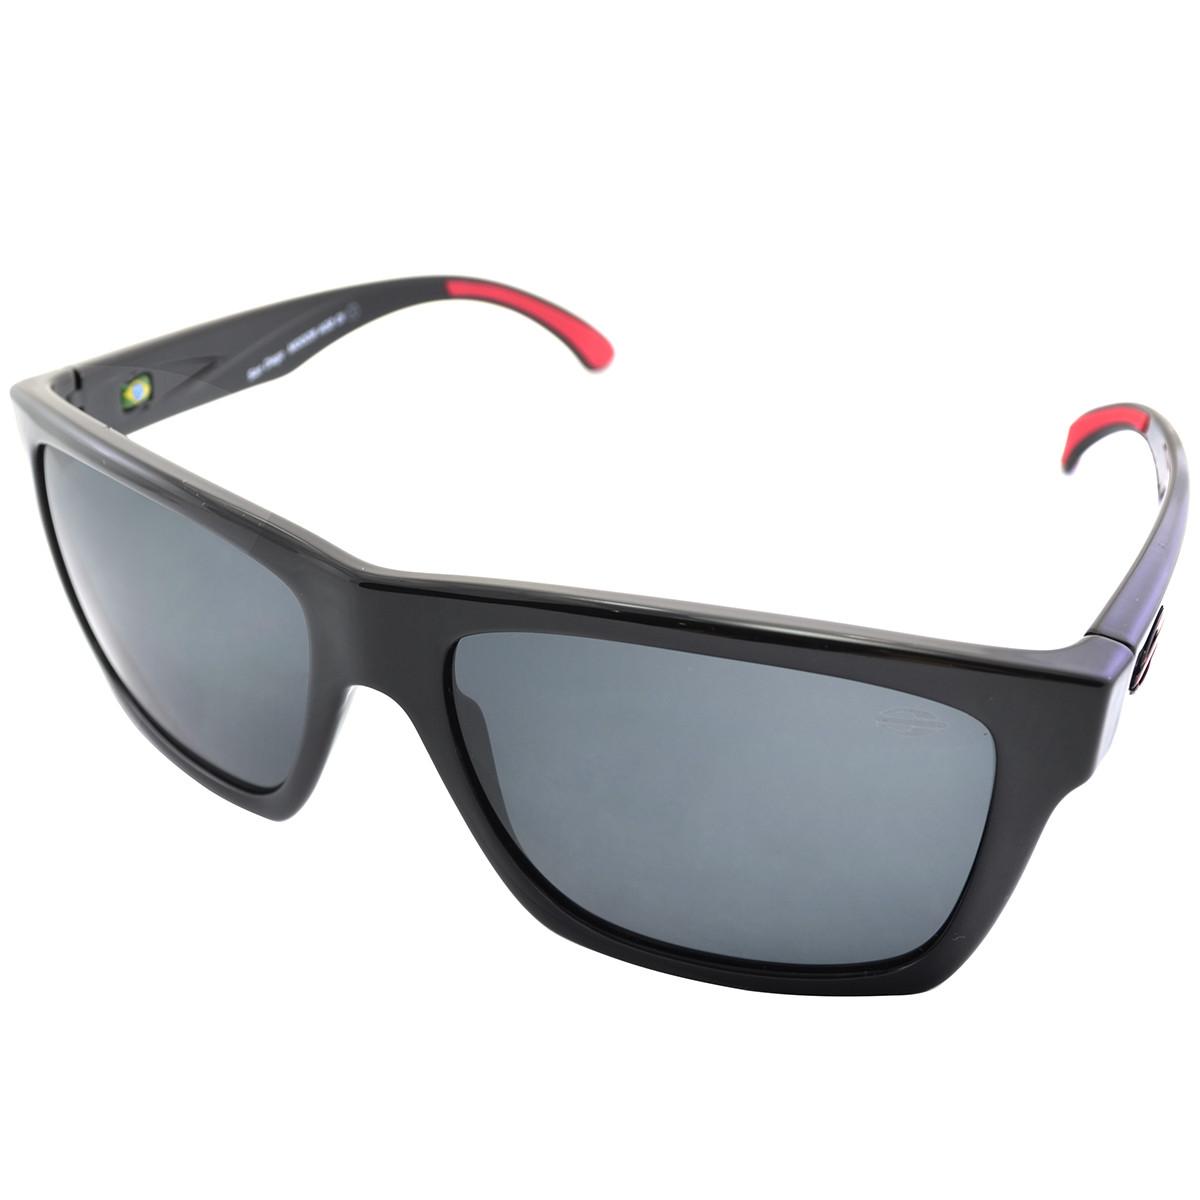 Óculos Mormaii San Diego Preto Brilho  Lente Cinza Polarizada ref ... 21af59a8e2